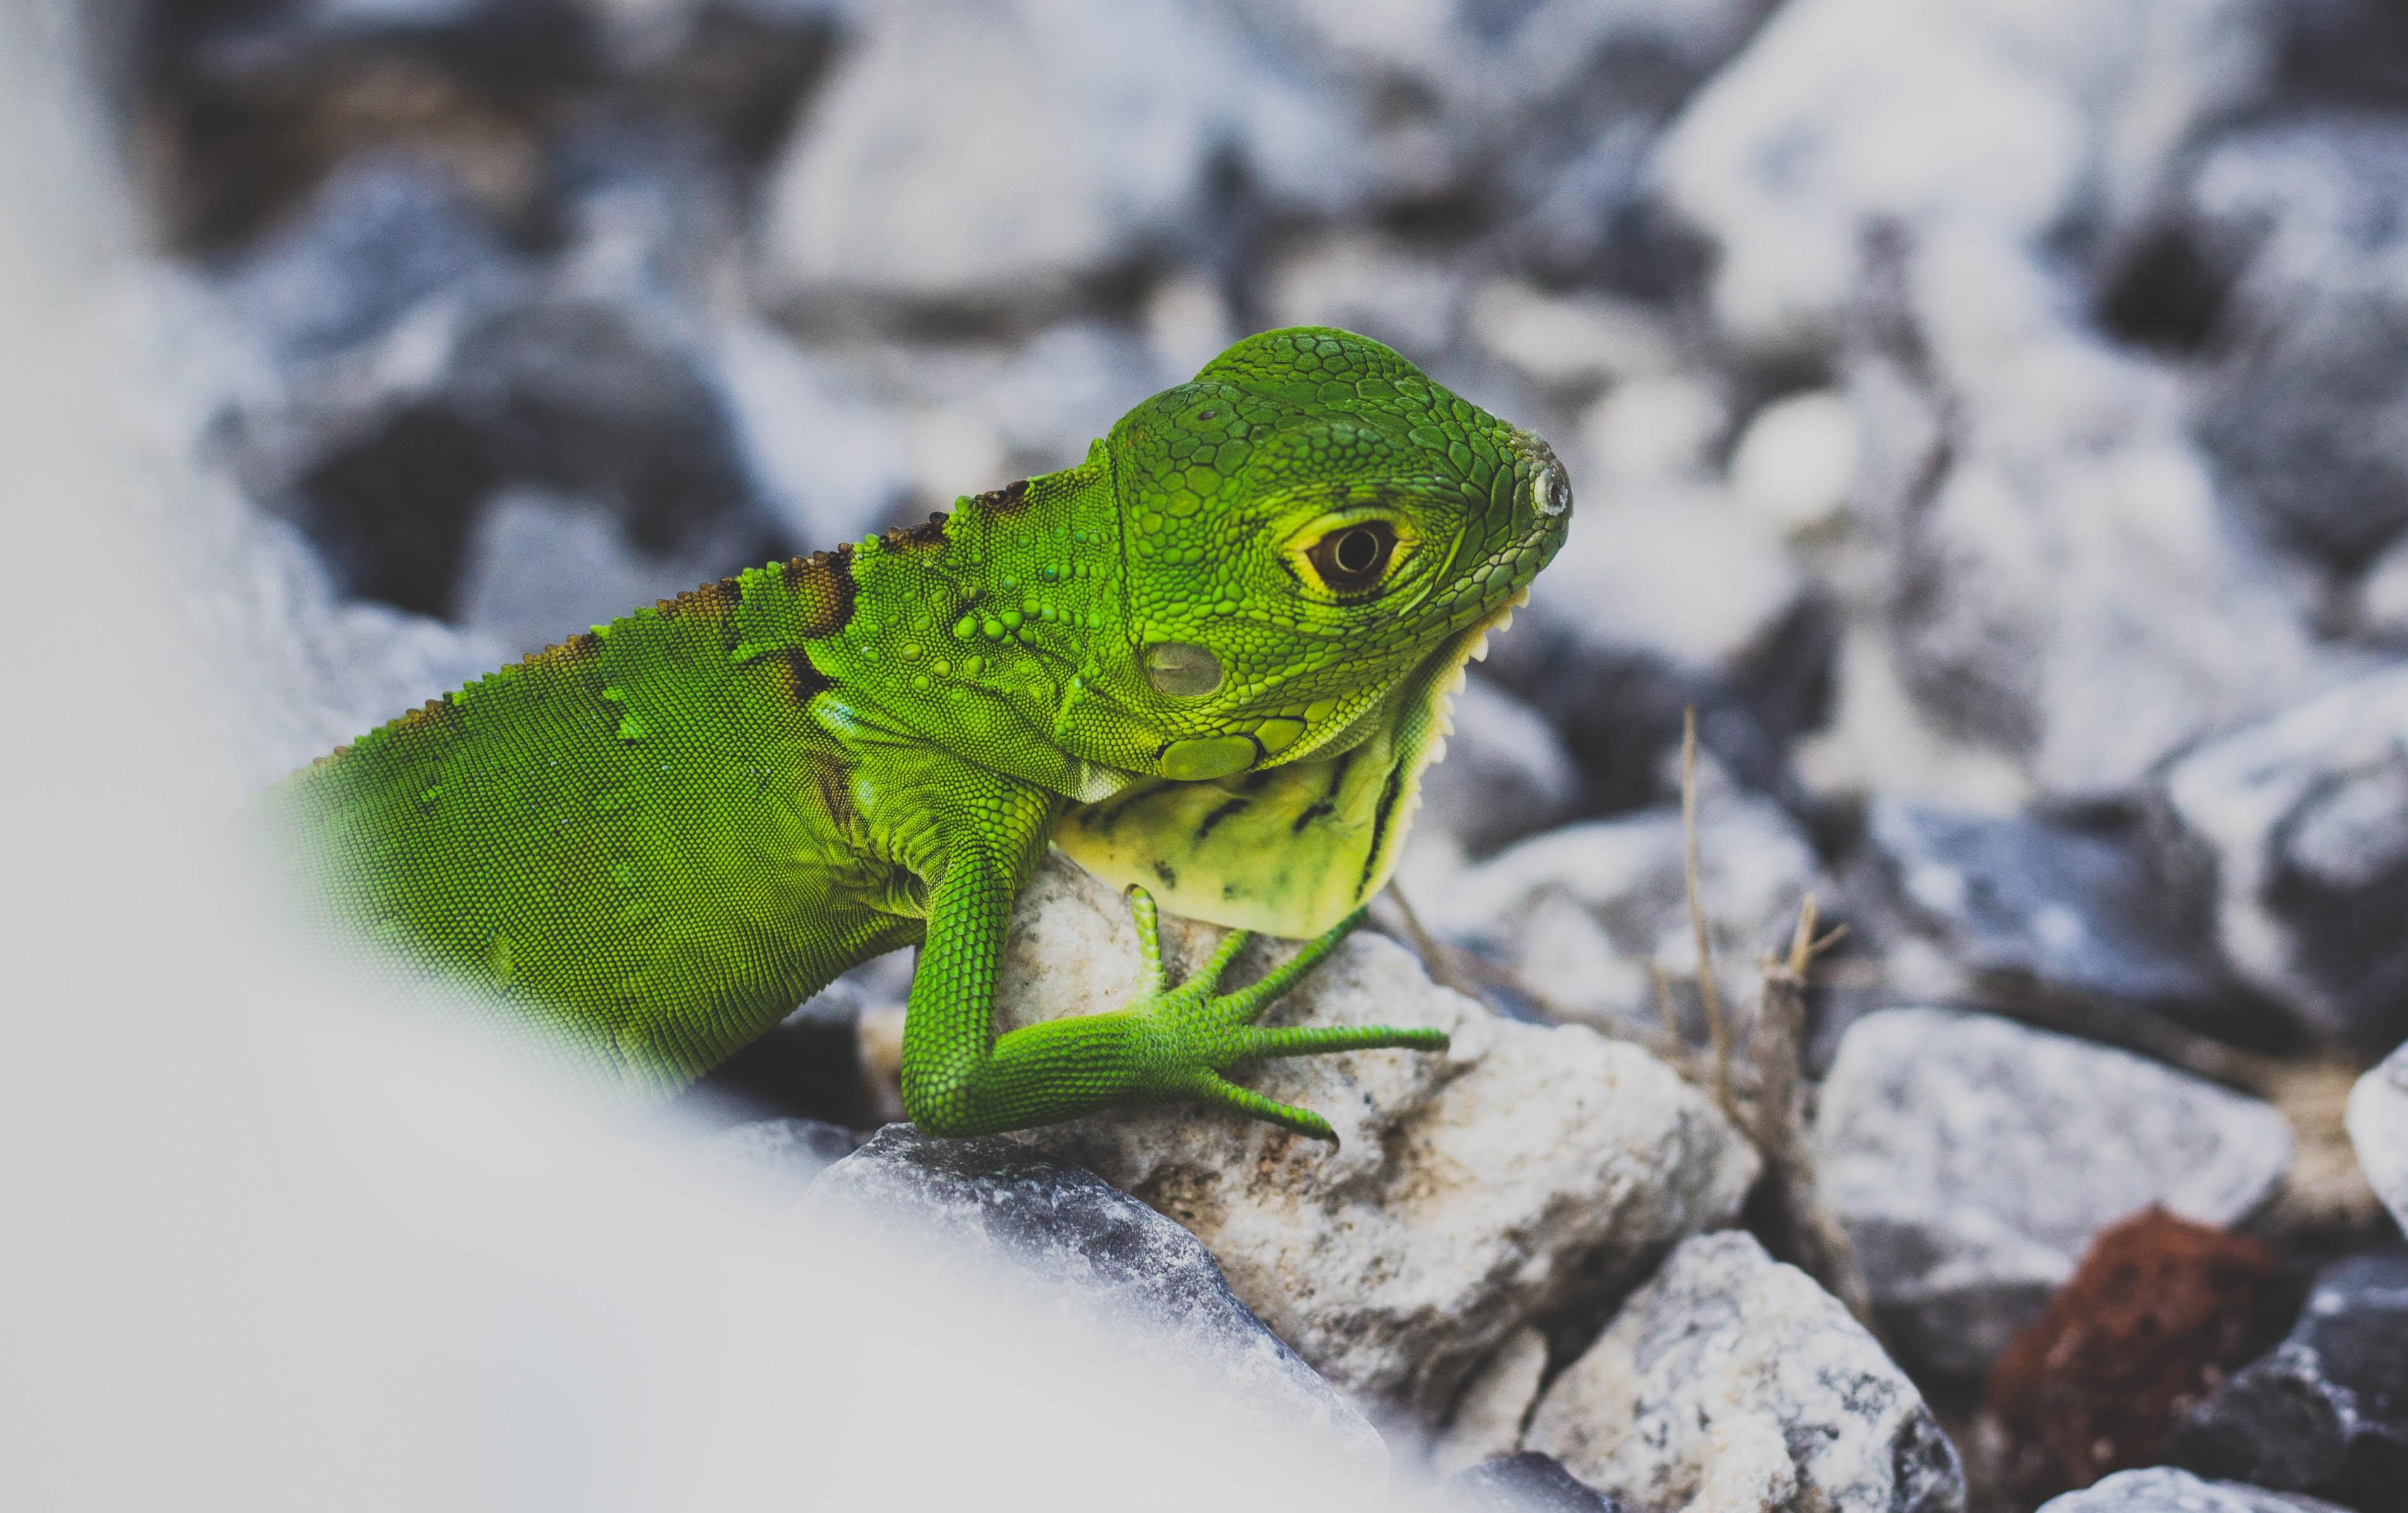 photo of green iguana on white stone